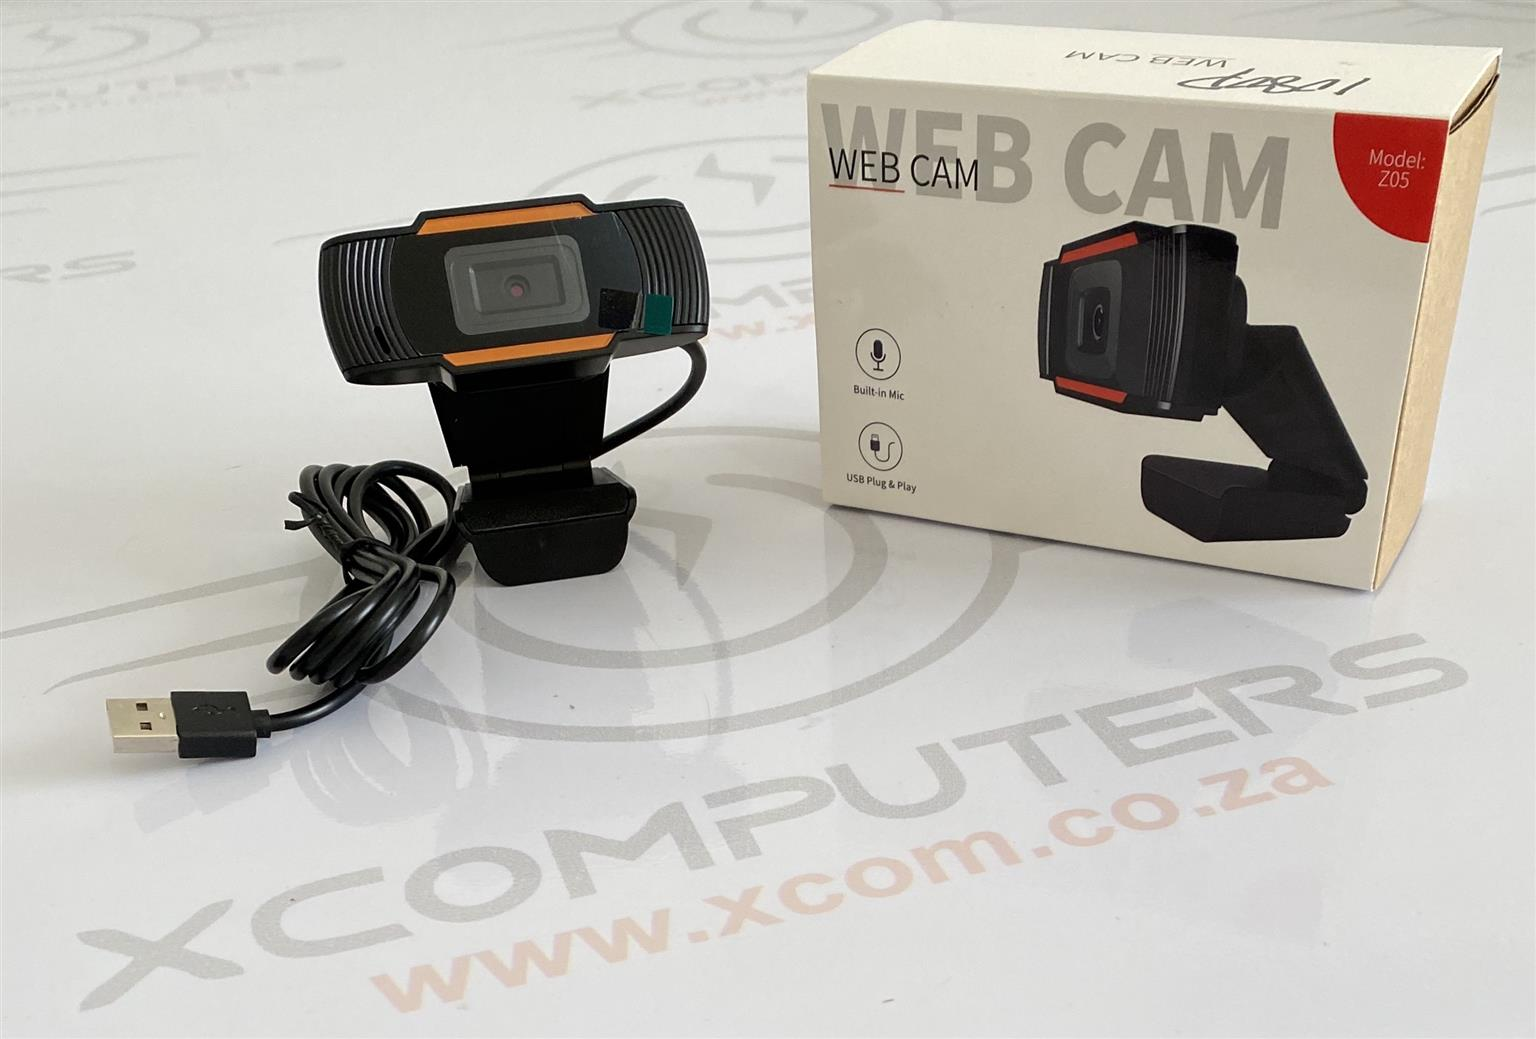 1080P High Definition WebCam